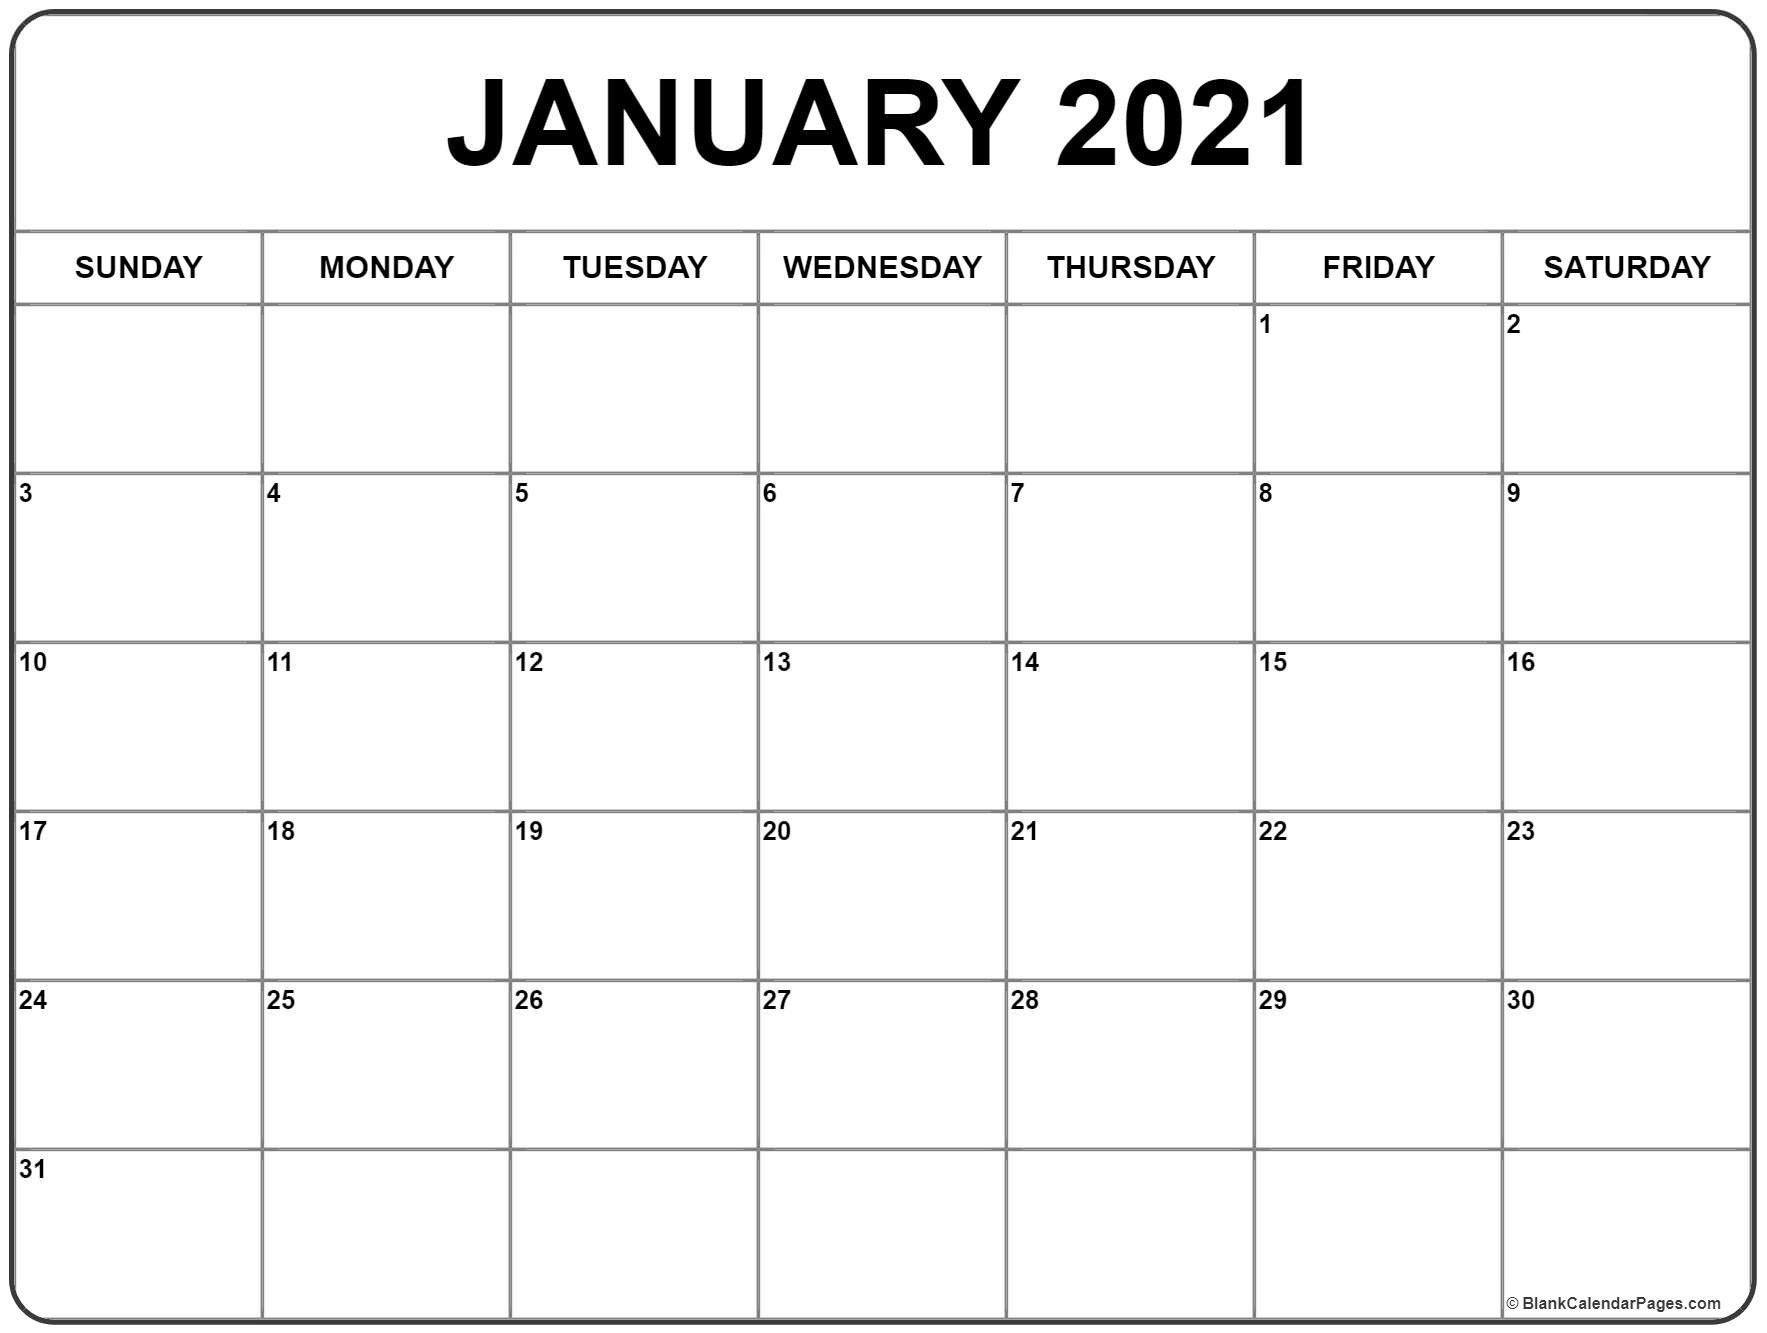 Print Monthly Calendar 2021 Free